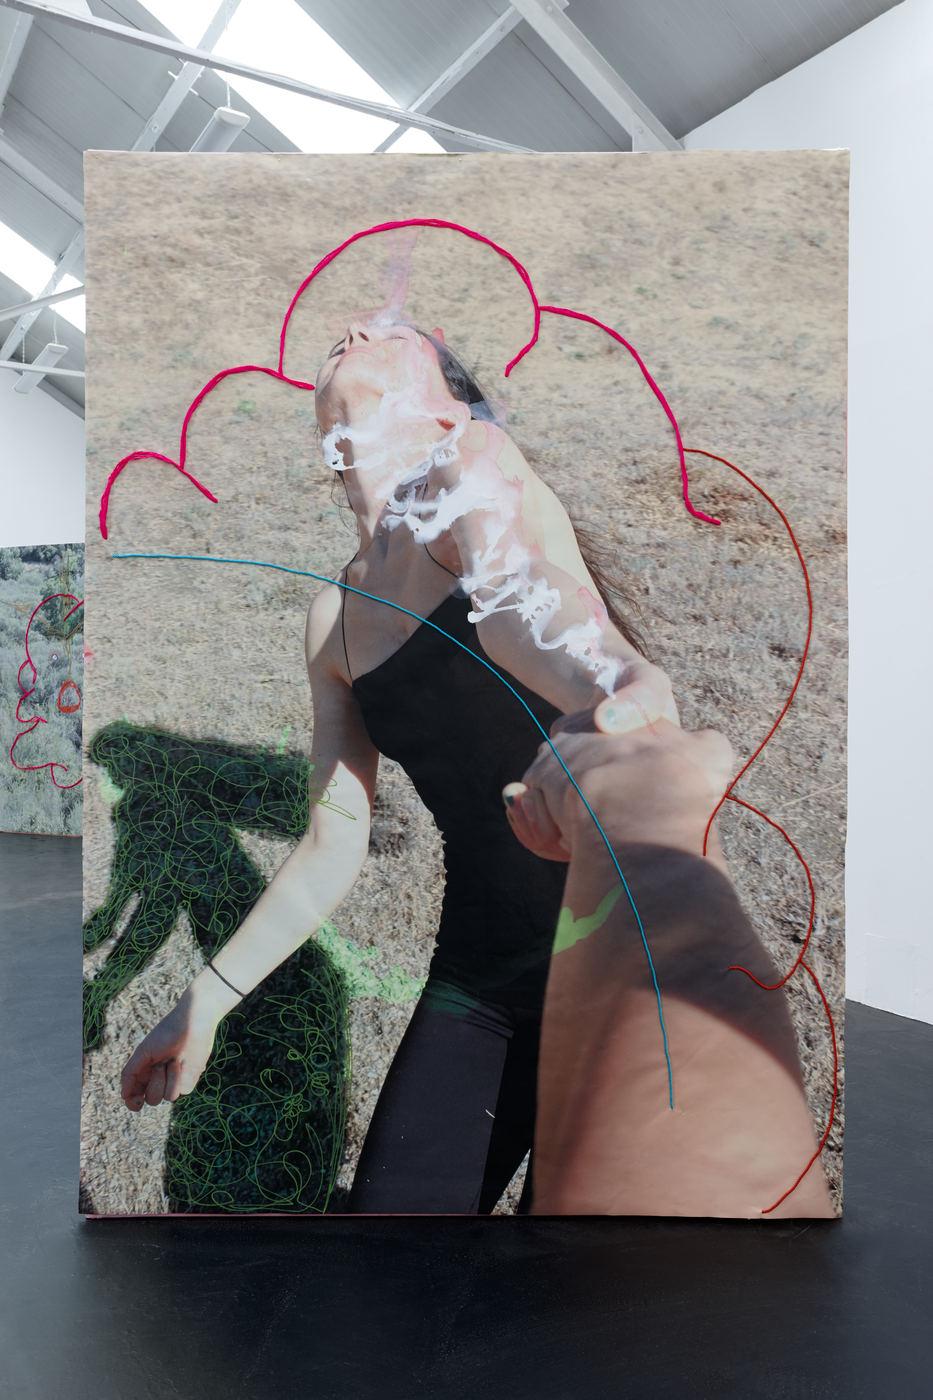 07. Nora Berman - I am a galactic activation portal (Calabasas spim), 2016 (ii)